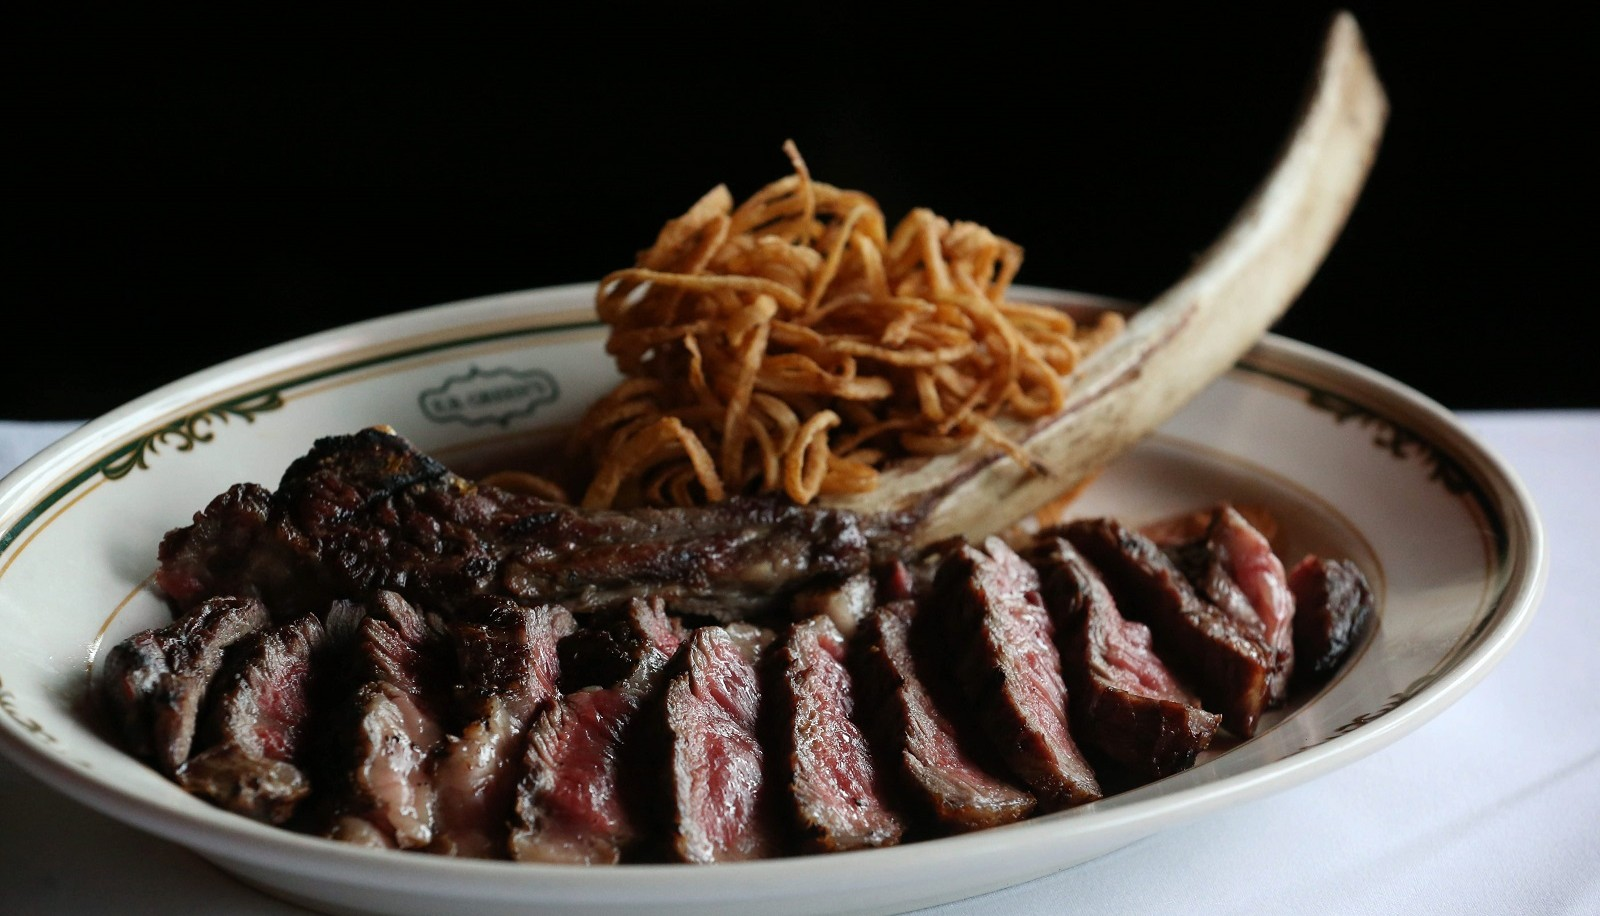 E.B. Green's Steakhouse's 30-ounce prime tomahawk ribeye comes with tobacco fried onions. (Sharon Cantillon/Buffalo News file photo)